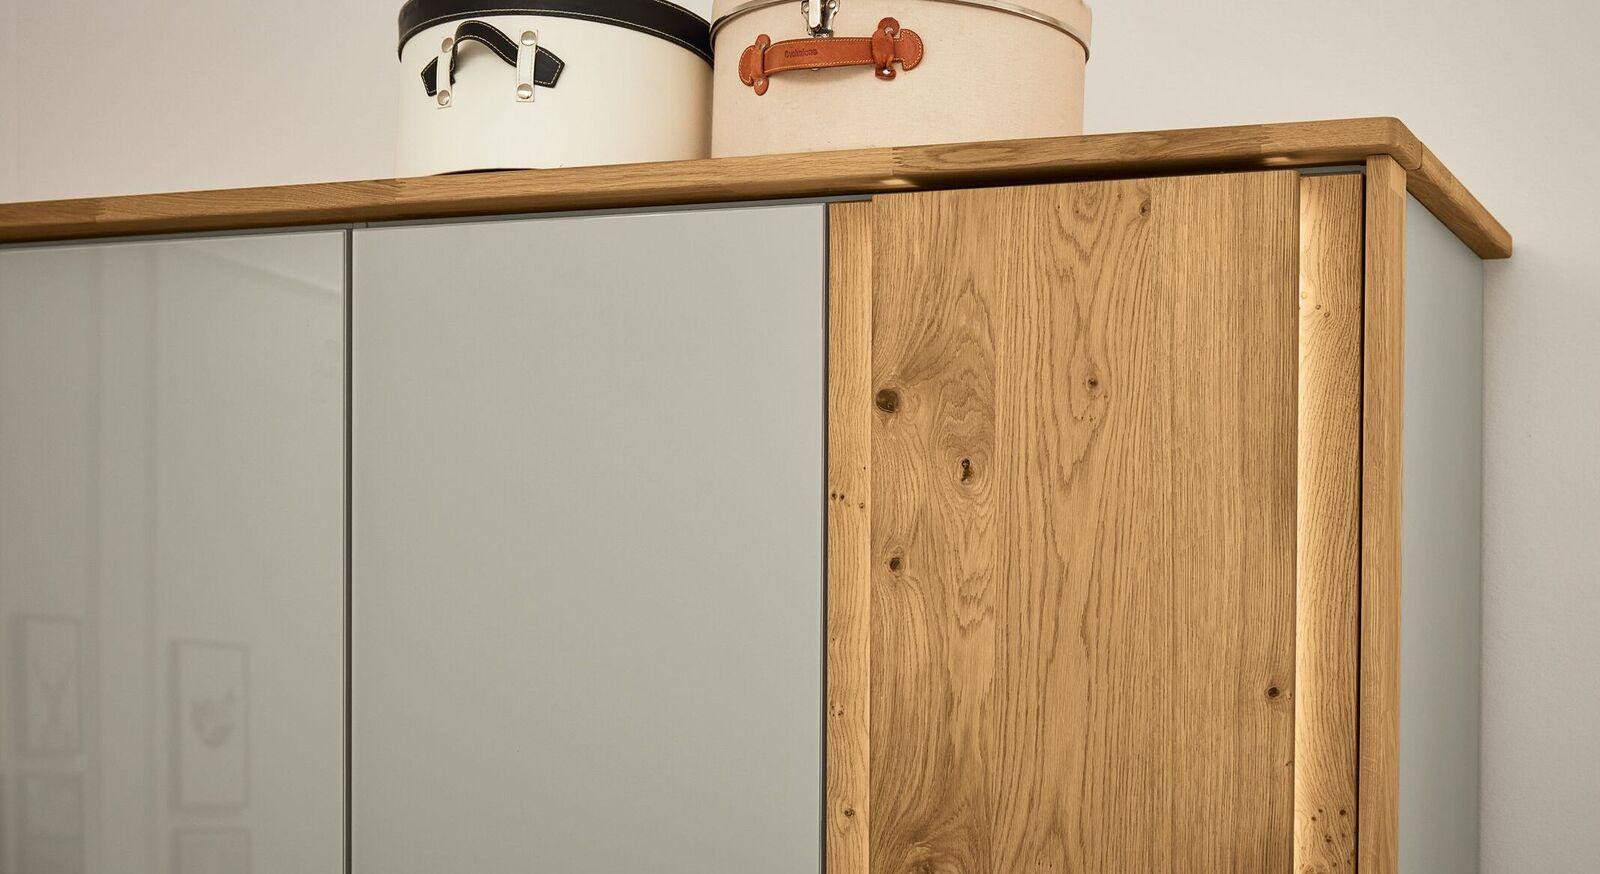 MUSTERRING Drehtüren-Kleiderschrank Saphira kieselgrau mit Passepartout-Rahmen